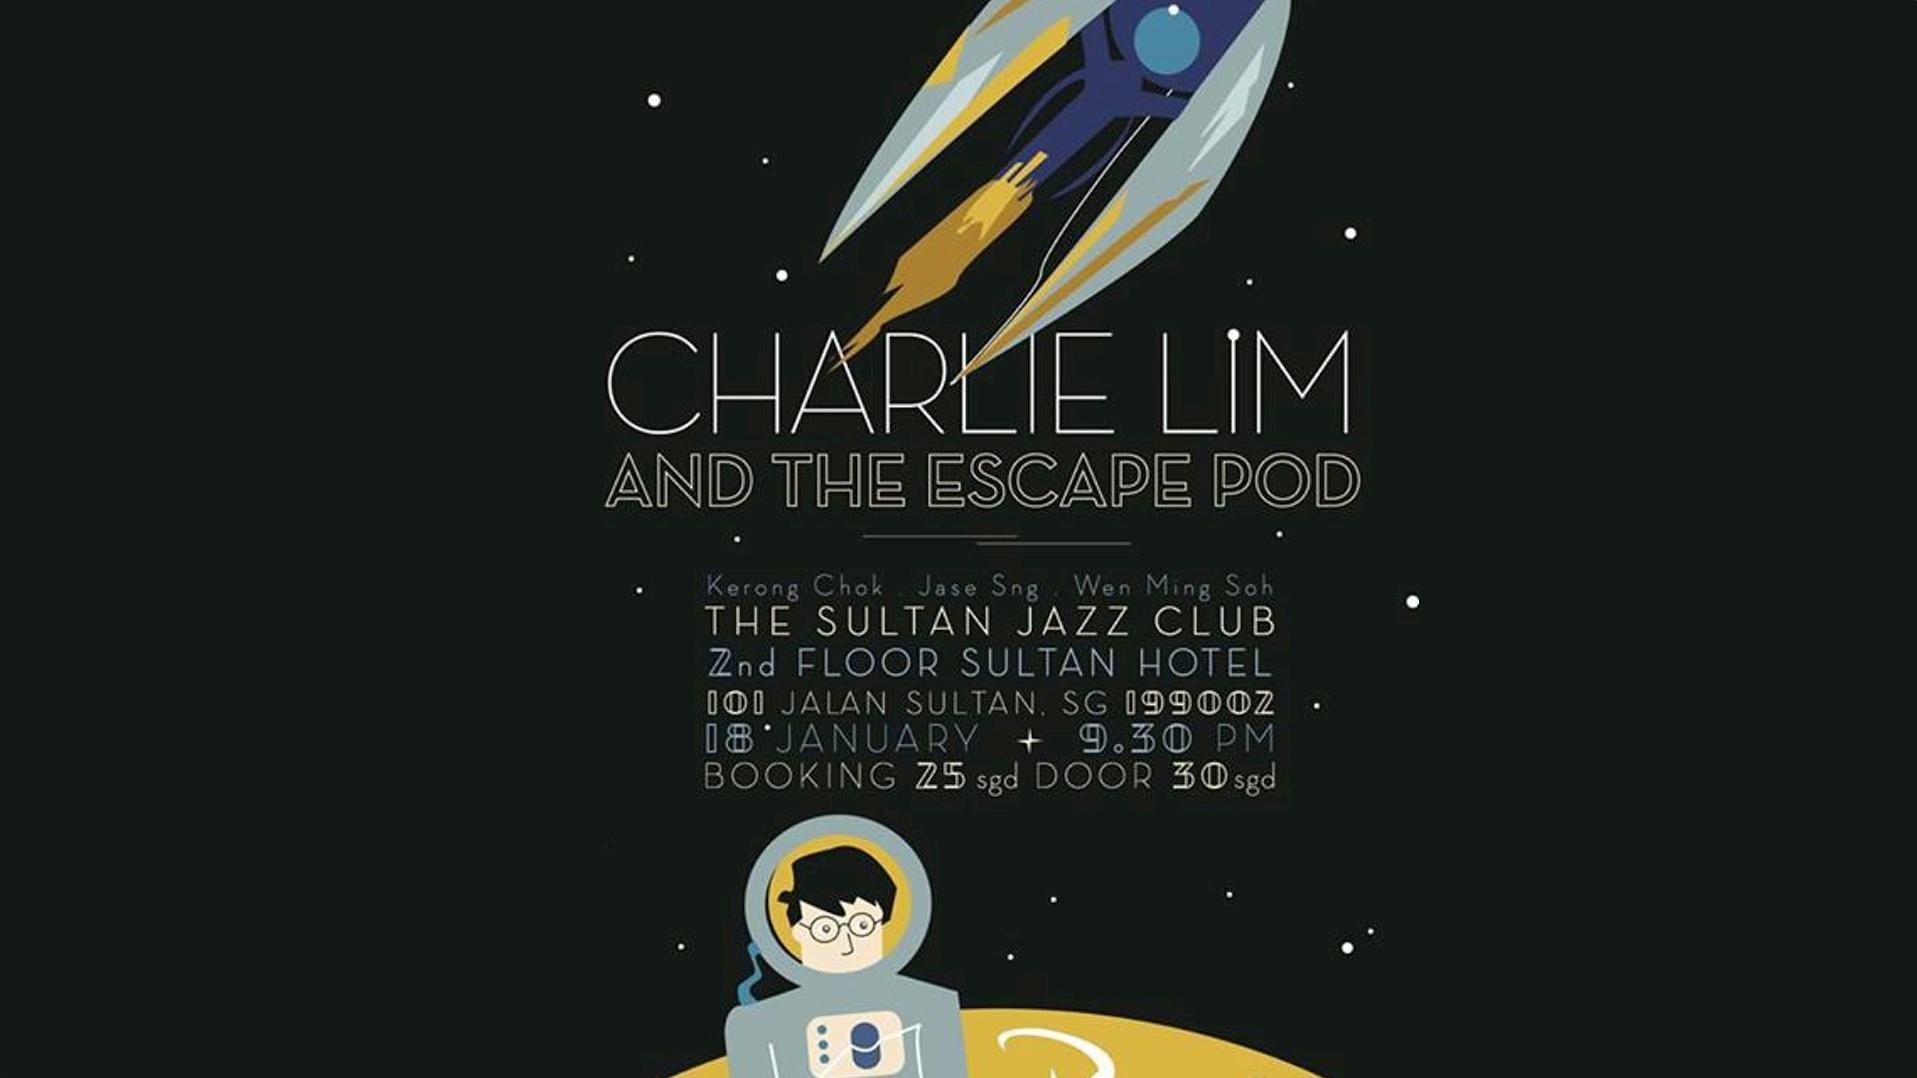 Charlie Lim & The Escape Pod